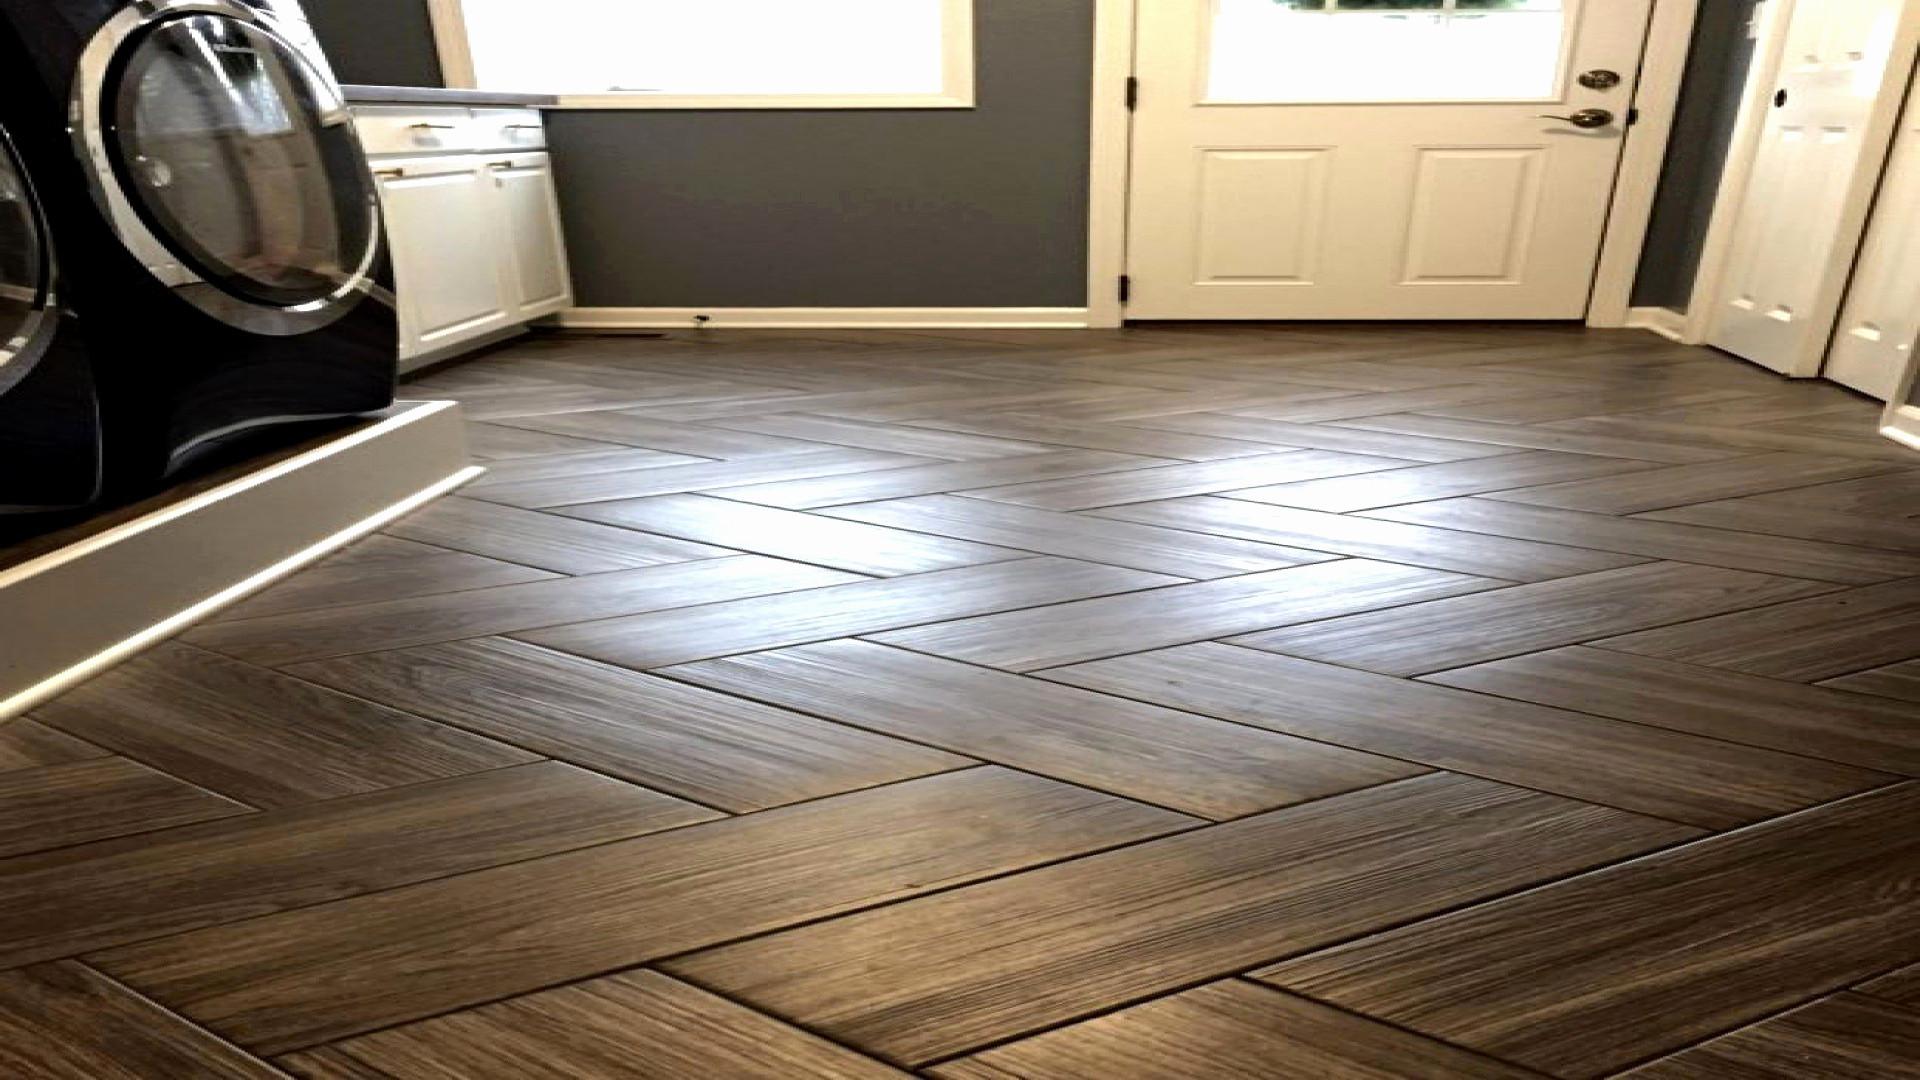 hardwood floor reducer of tile to hardwood transition best of wood floor to tile transition inside tile to hardwood transition fresh 50 inspirational herringbone wood tile floor graphics 50 s